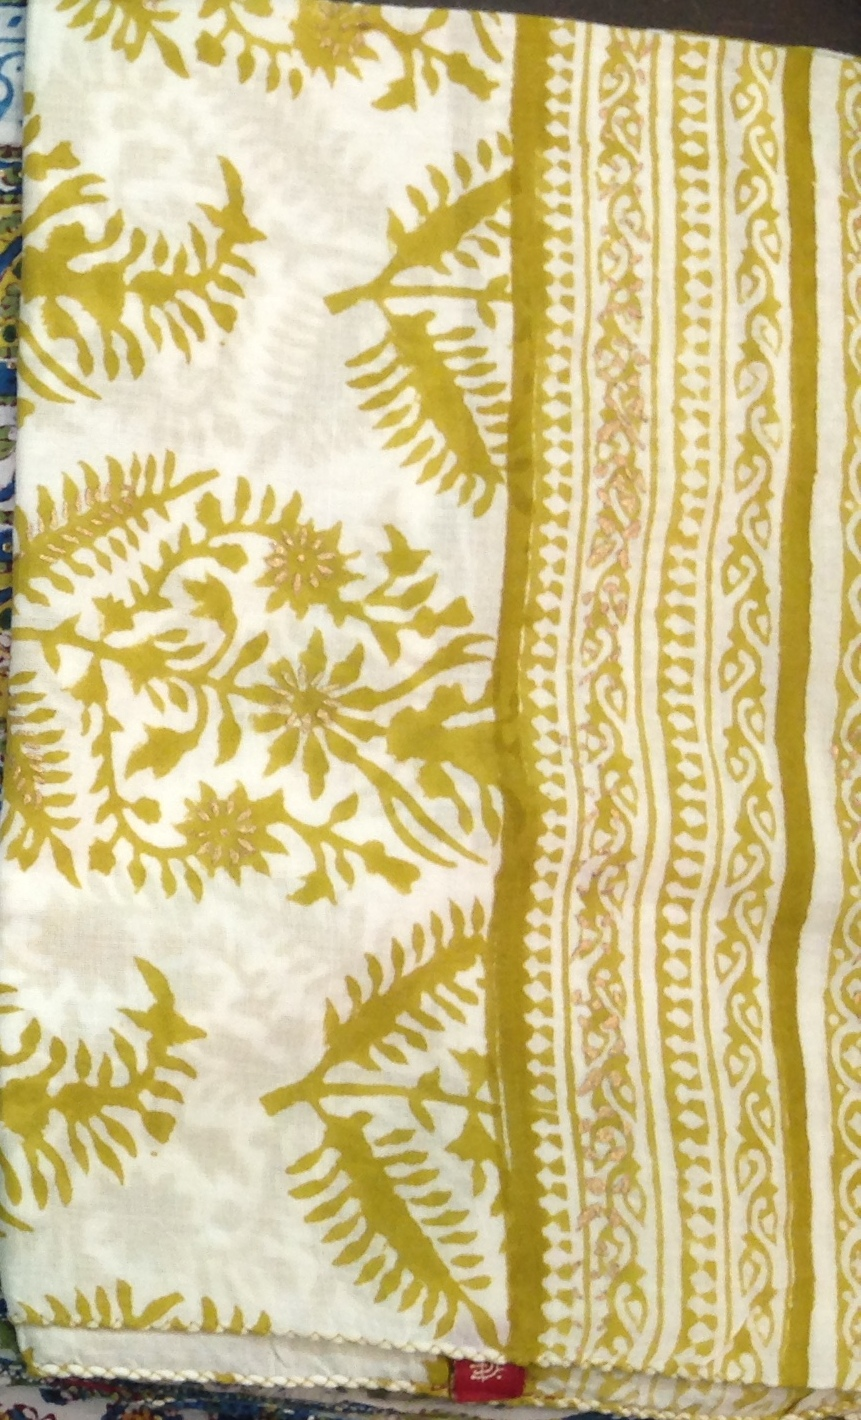 Anokhi Cotton Voile long rectangular scarf